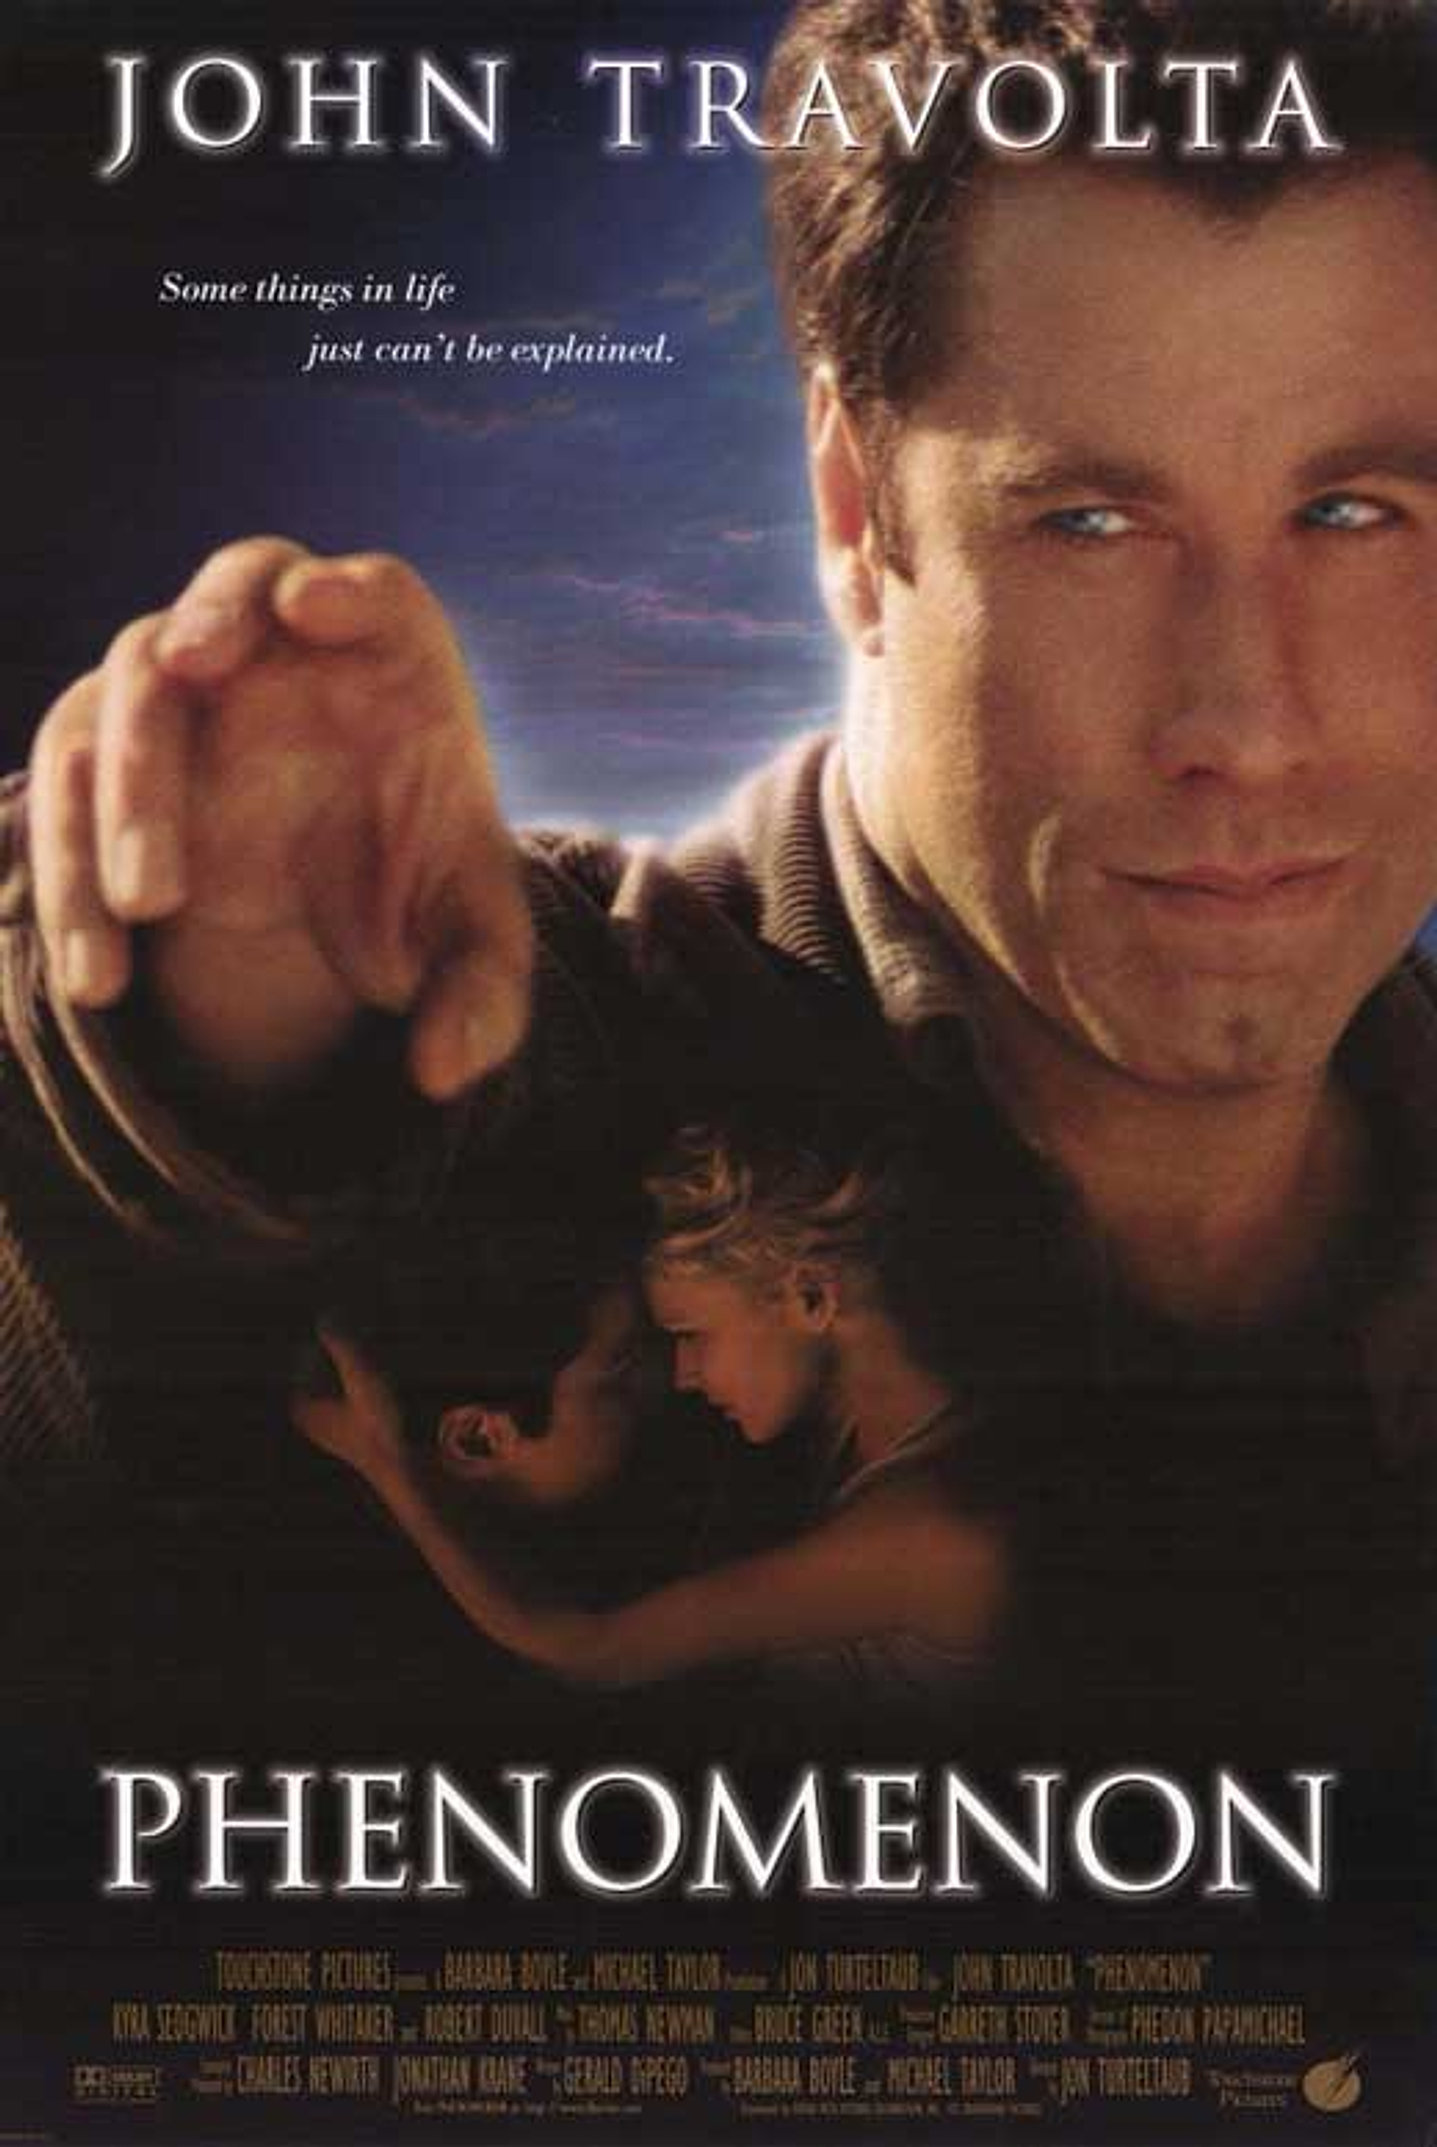 phenomenon-movie-poster-1996-1020221776